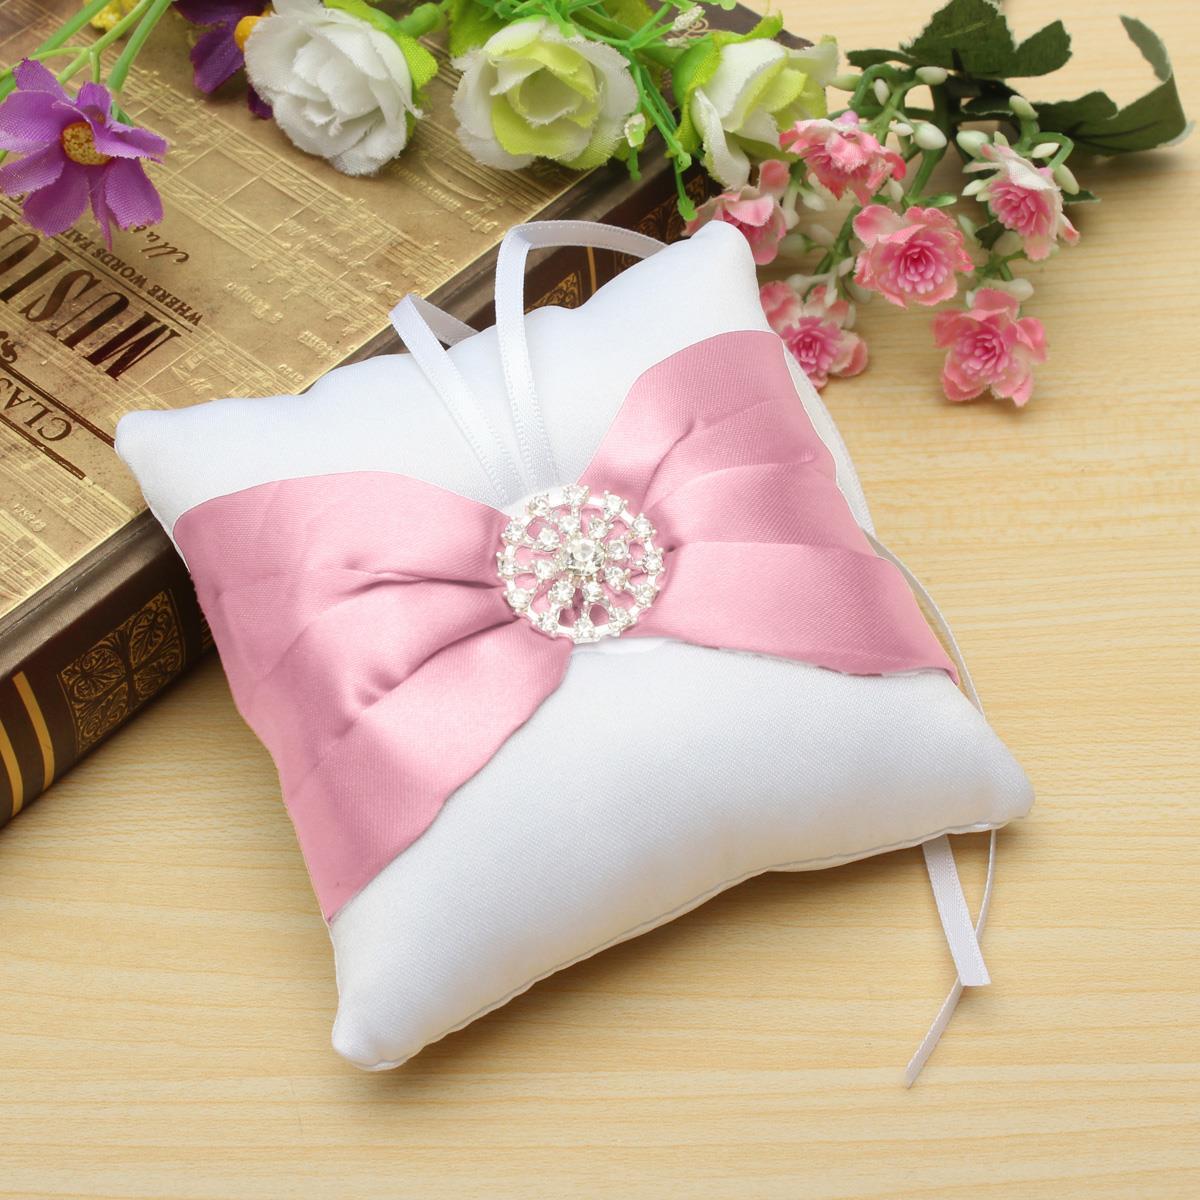 9cm*9cm Bowknot Diamante Display Cushion Romantic Wedding Ring Gift ...